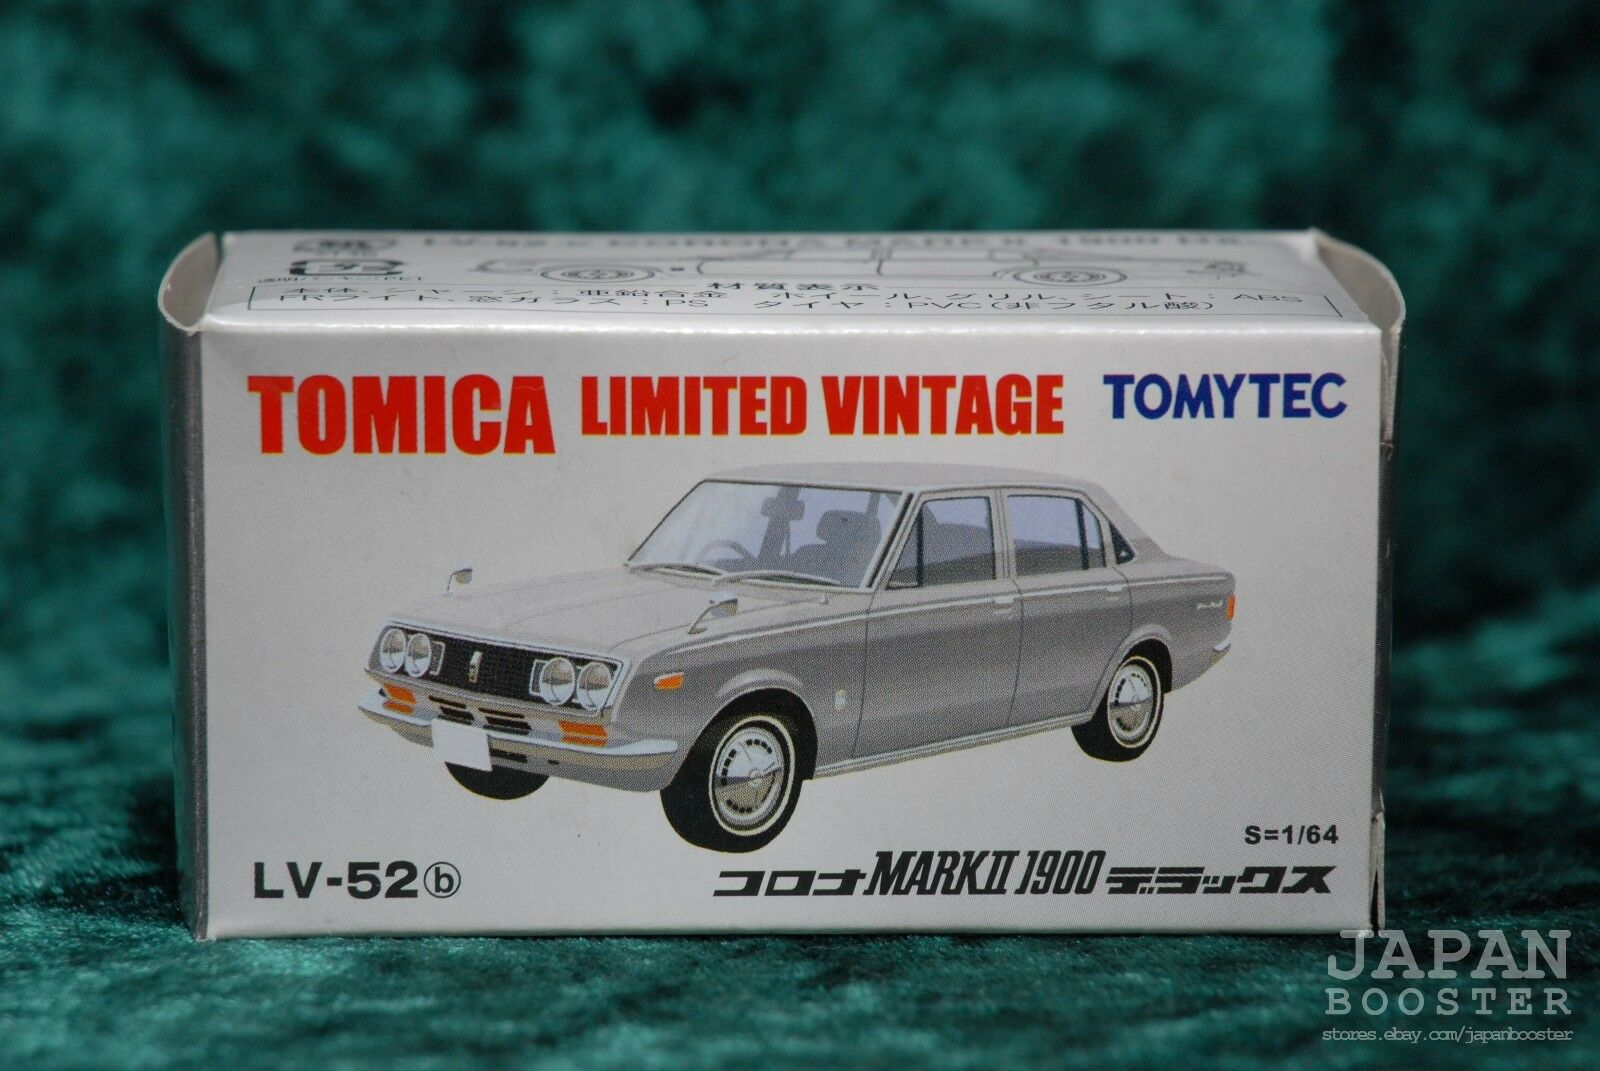 Tomytec Tomica Limited Vintage Corona Mark Ii 1900 Deluxe Lv 52b For Sale Online Ebay